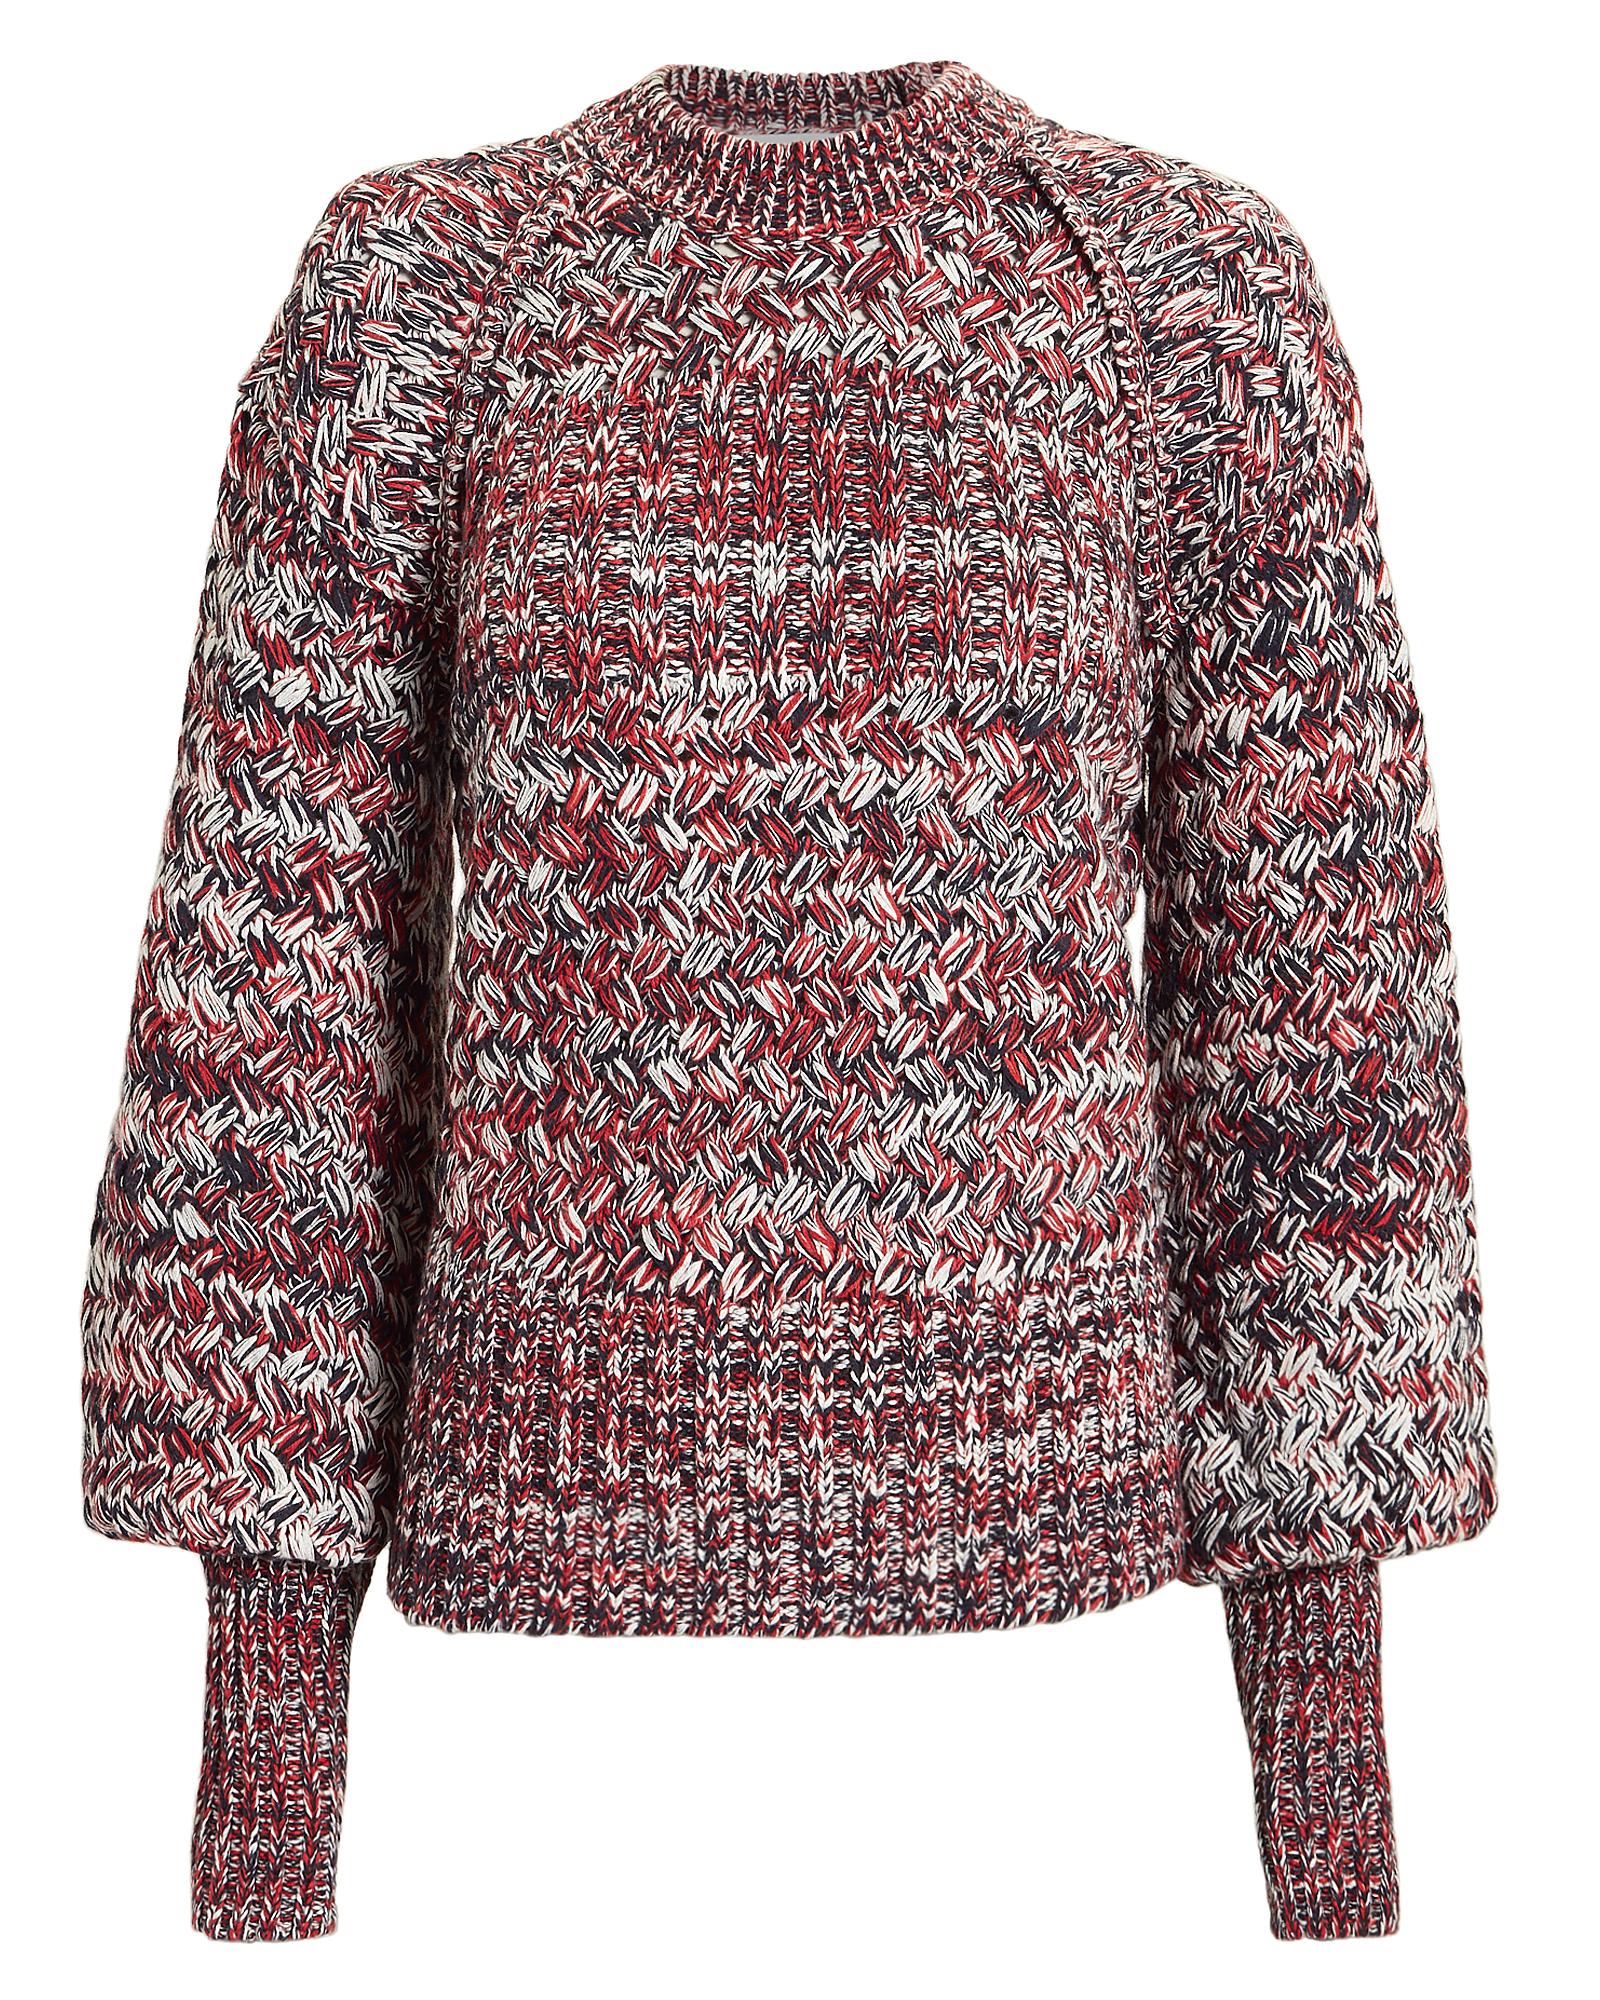 Self-Portrait Clothing Melange Crew Neck Sweater